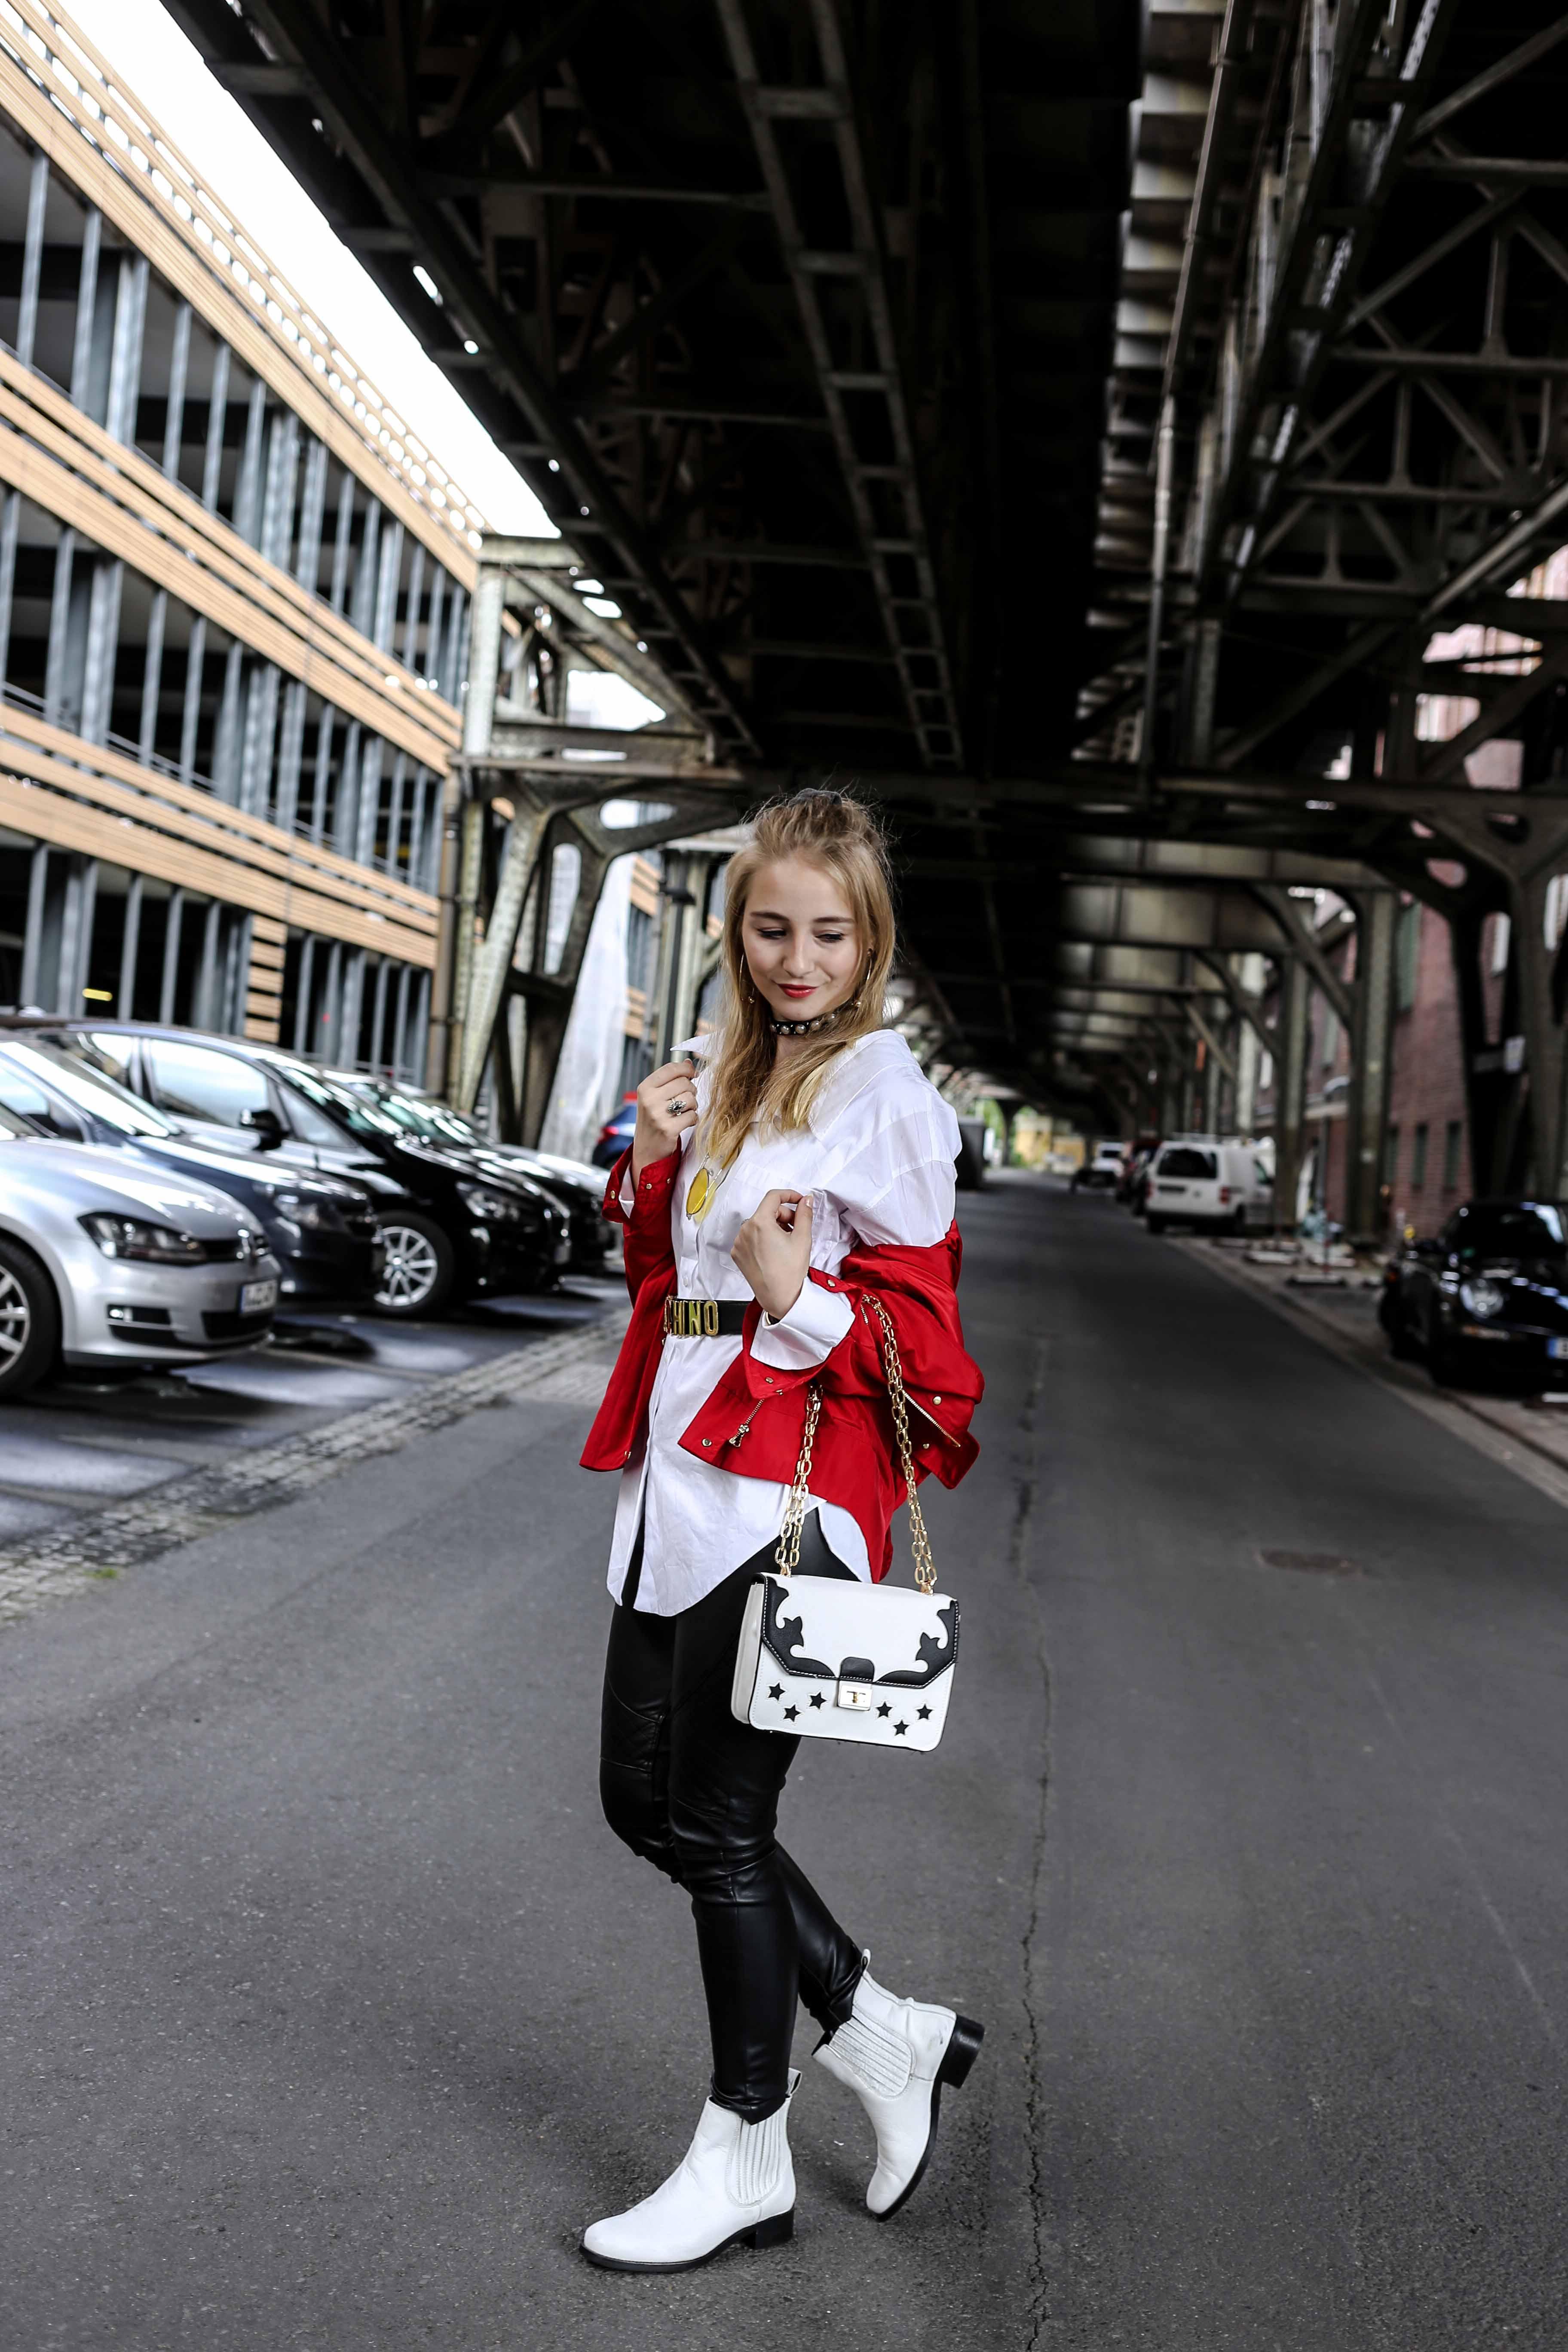 fashion-week-look-rote-regenjacke-grunge-outfit-berlin-modeblog-fashionblog_9310